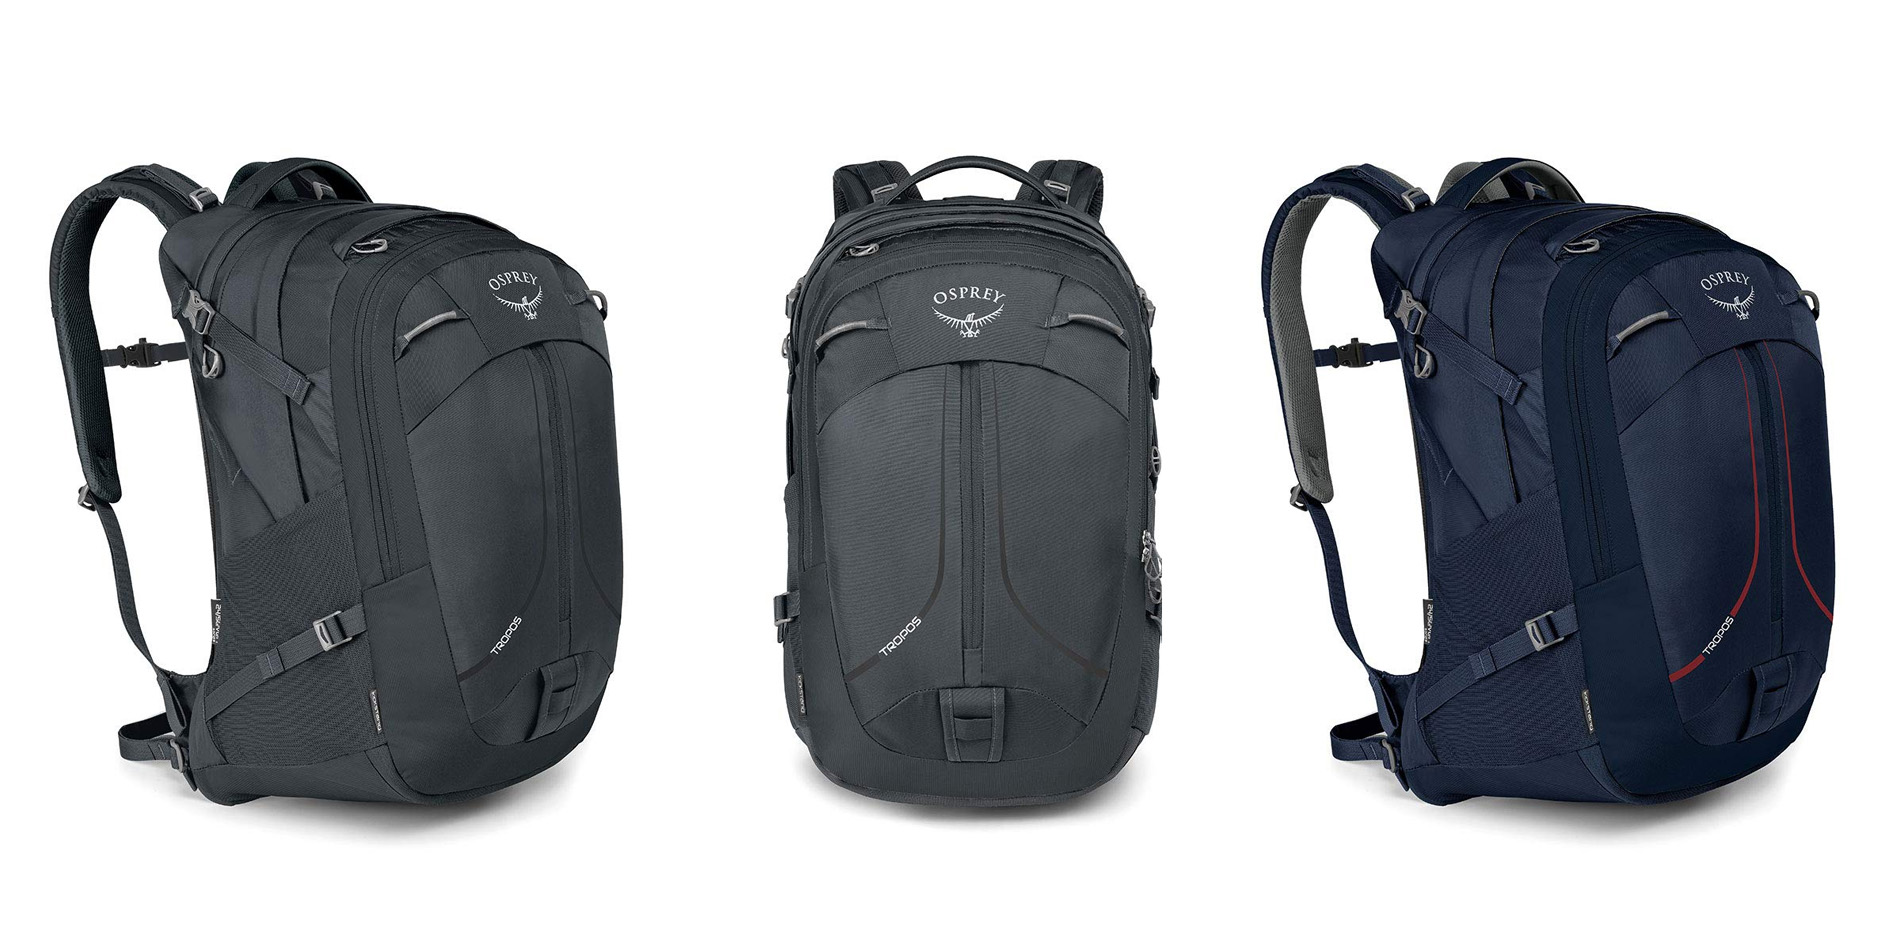 Osprey Packs Tropos MacBook Dayback drops to $111 shipped at Amazon (Reg. $150)